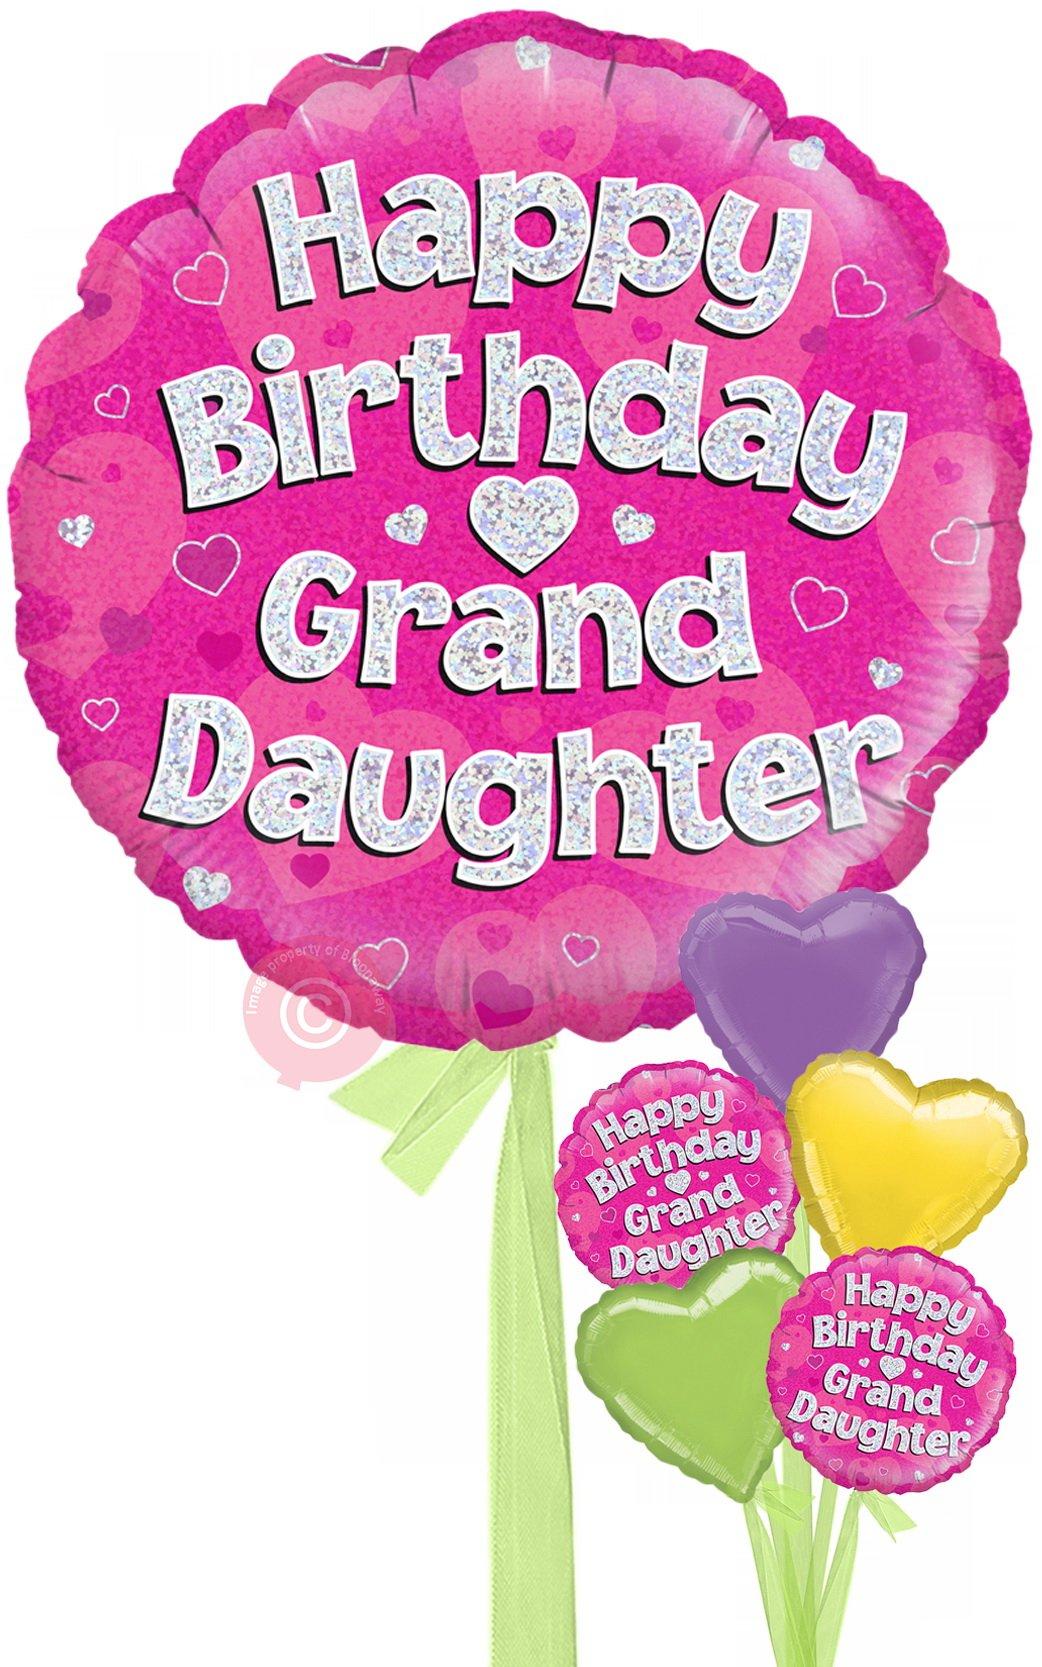 Happy birthday granddaughter clipart jpg free stock Happy Birthday Granddaughter Holographic jpg free stock